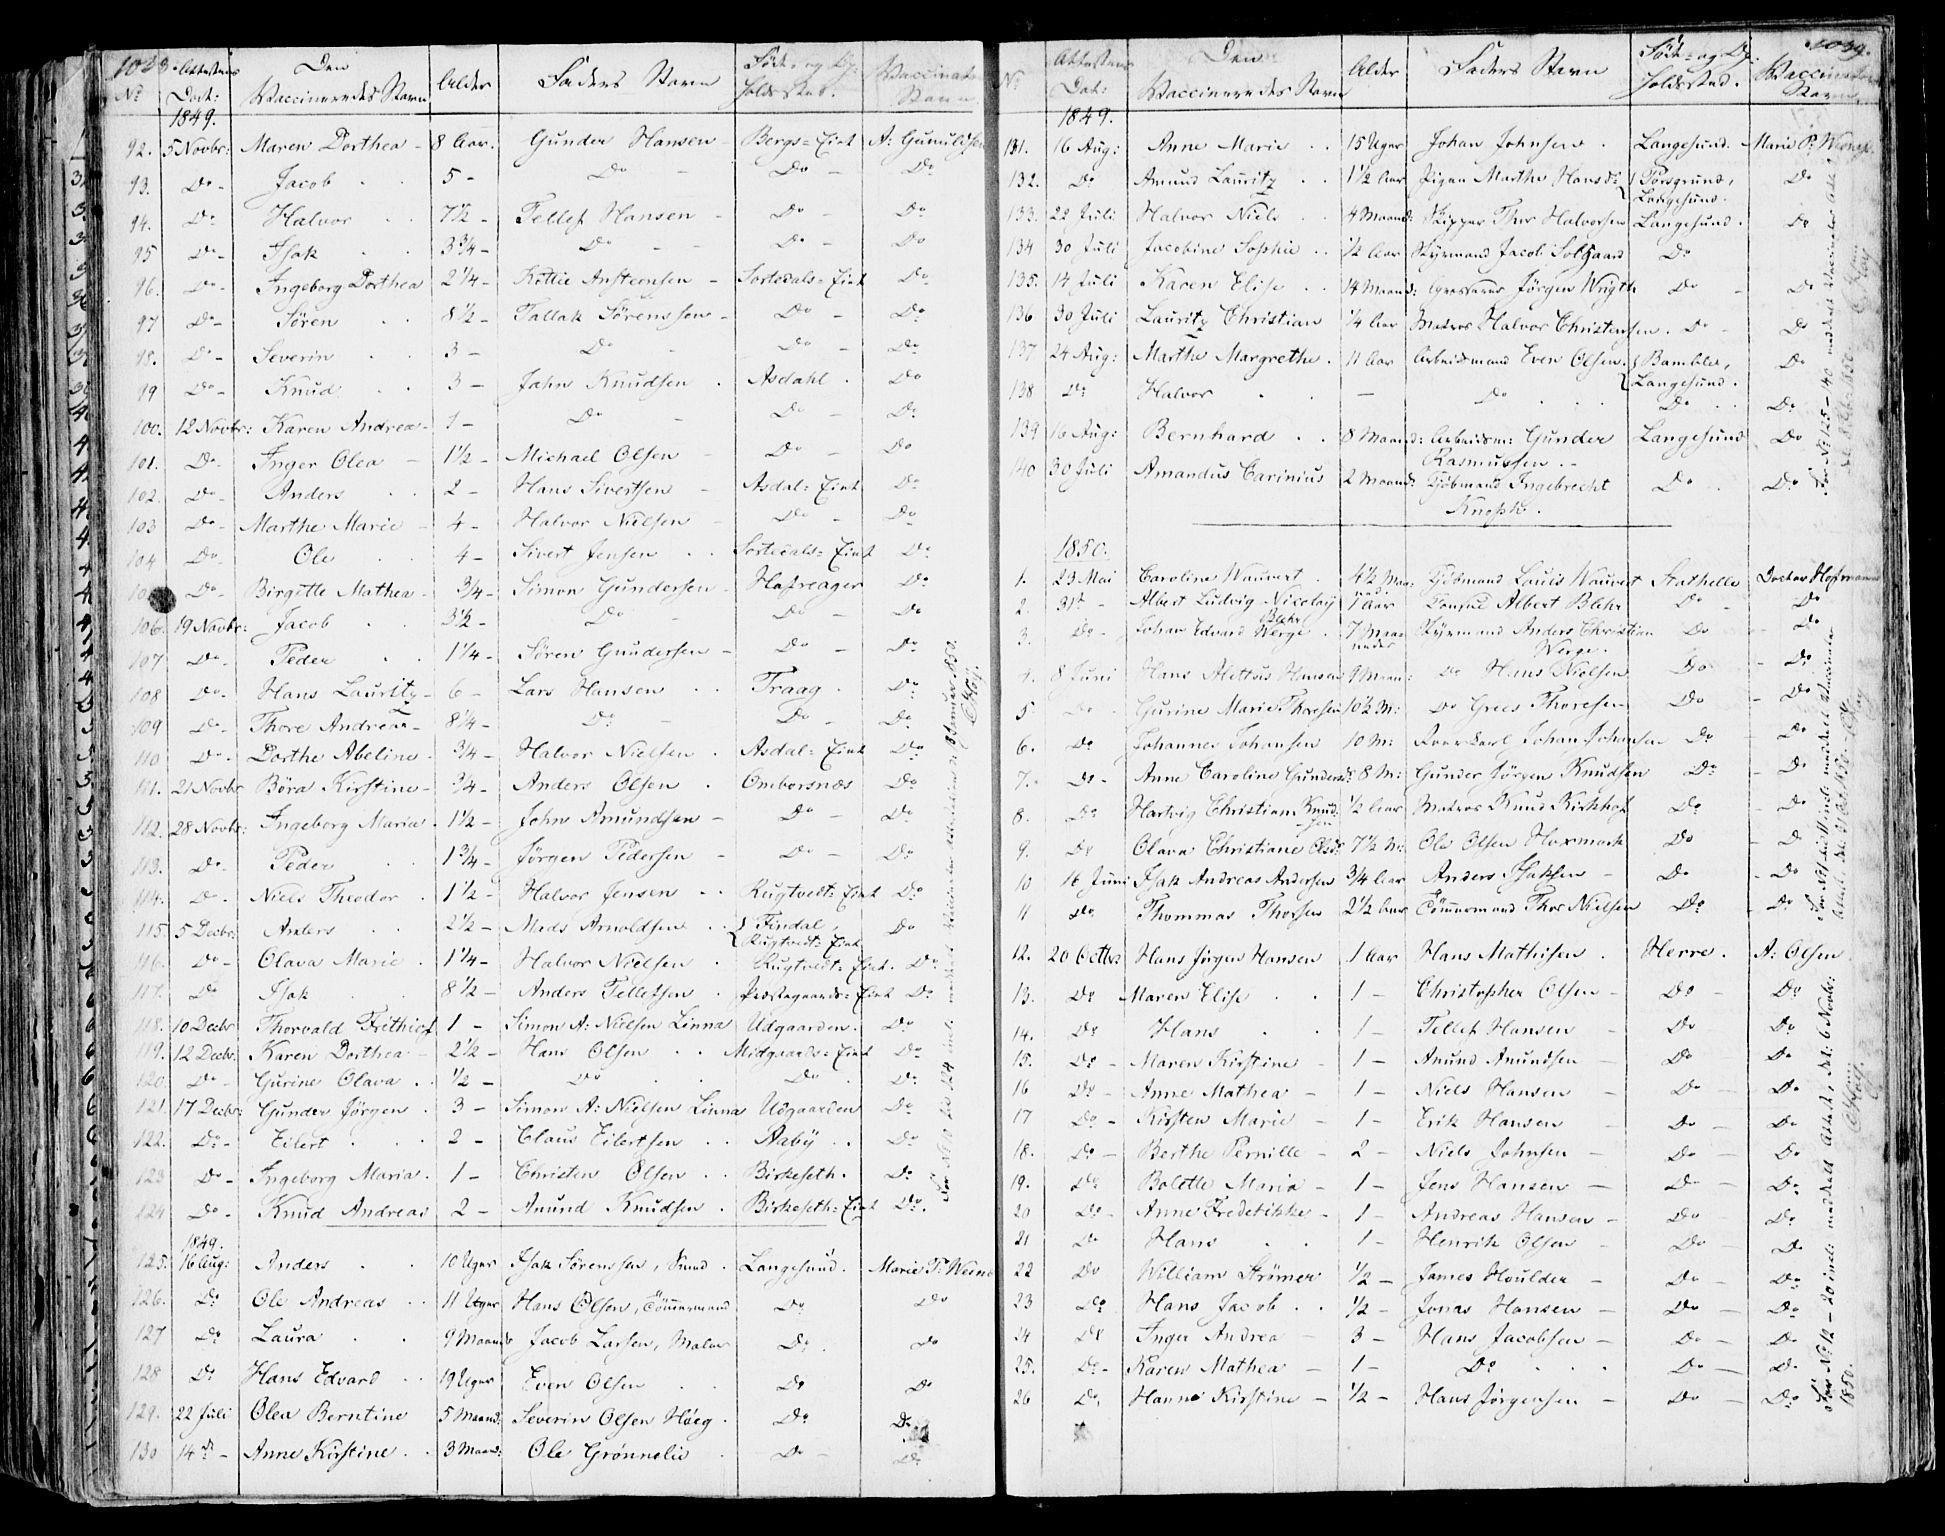 SAKO, Bamble kirkebøker, F/Fa/L0004: Ministerialbok nr. I 4, 1834-1853, s. 1038-1039